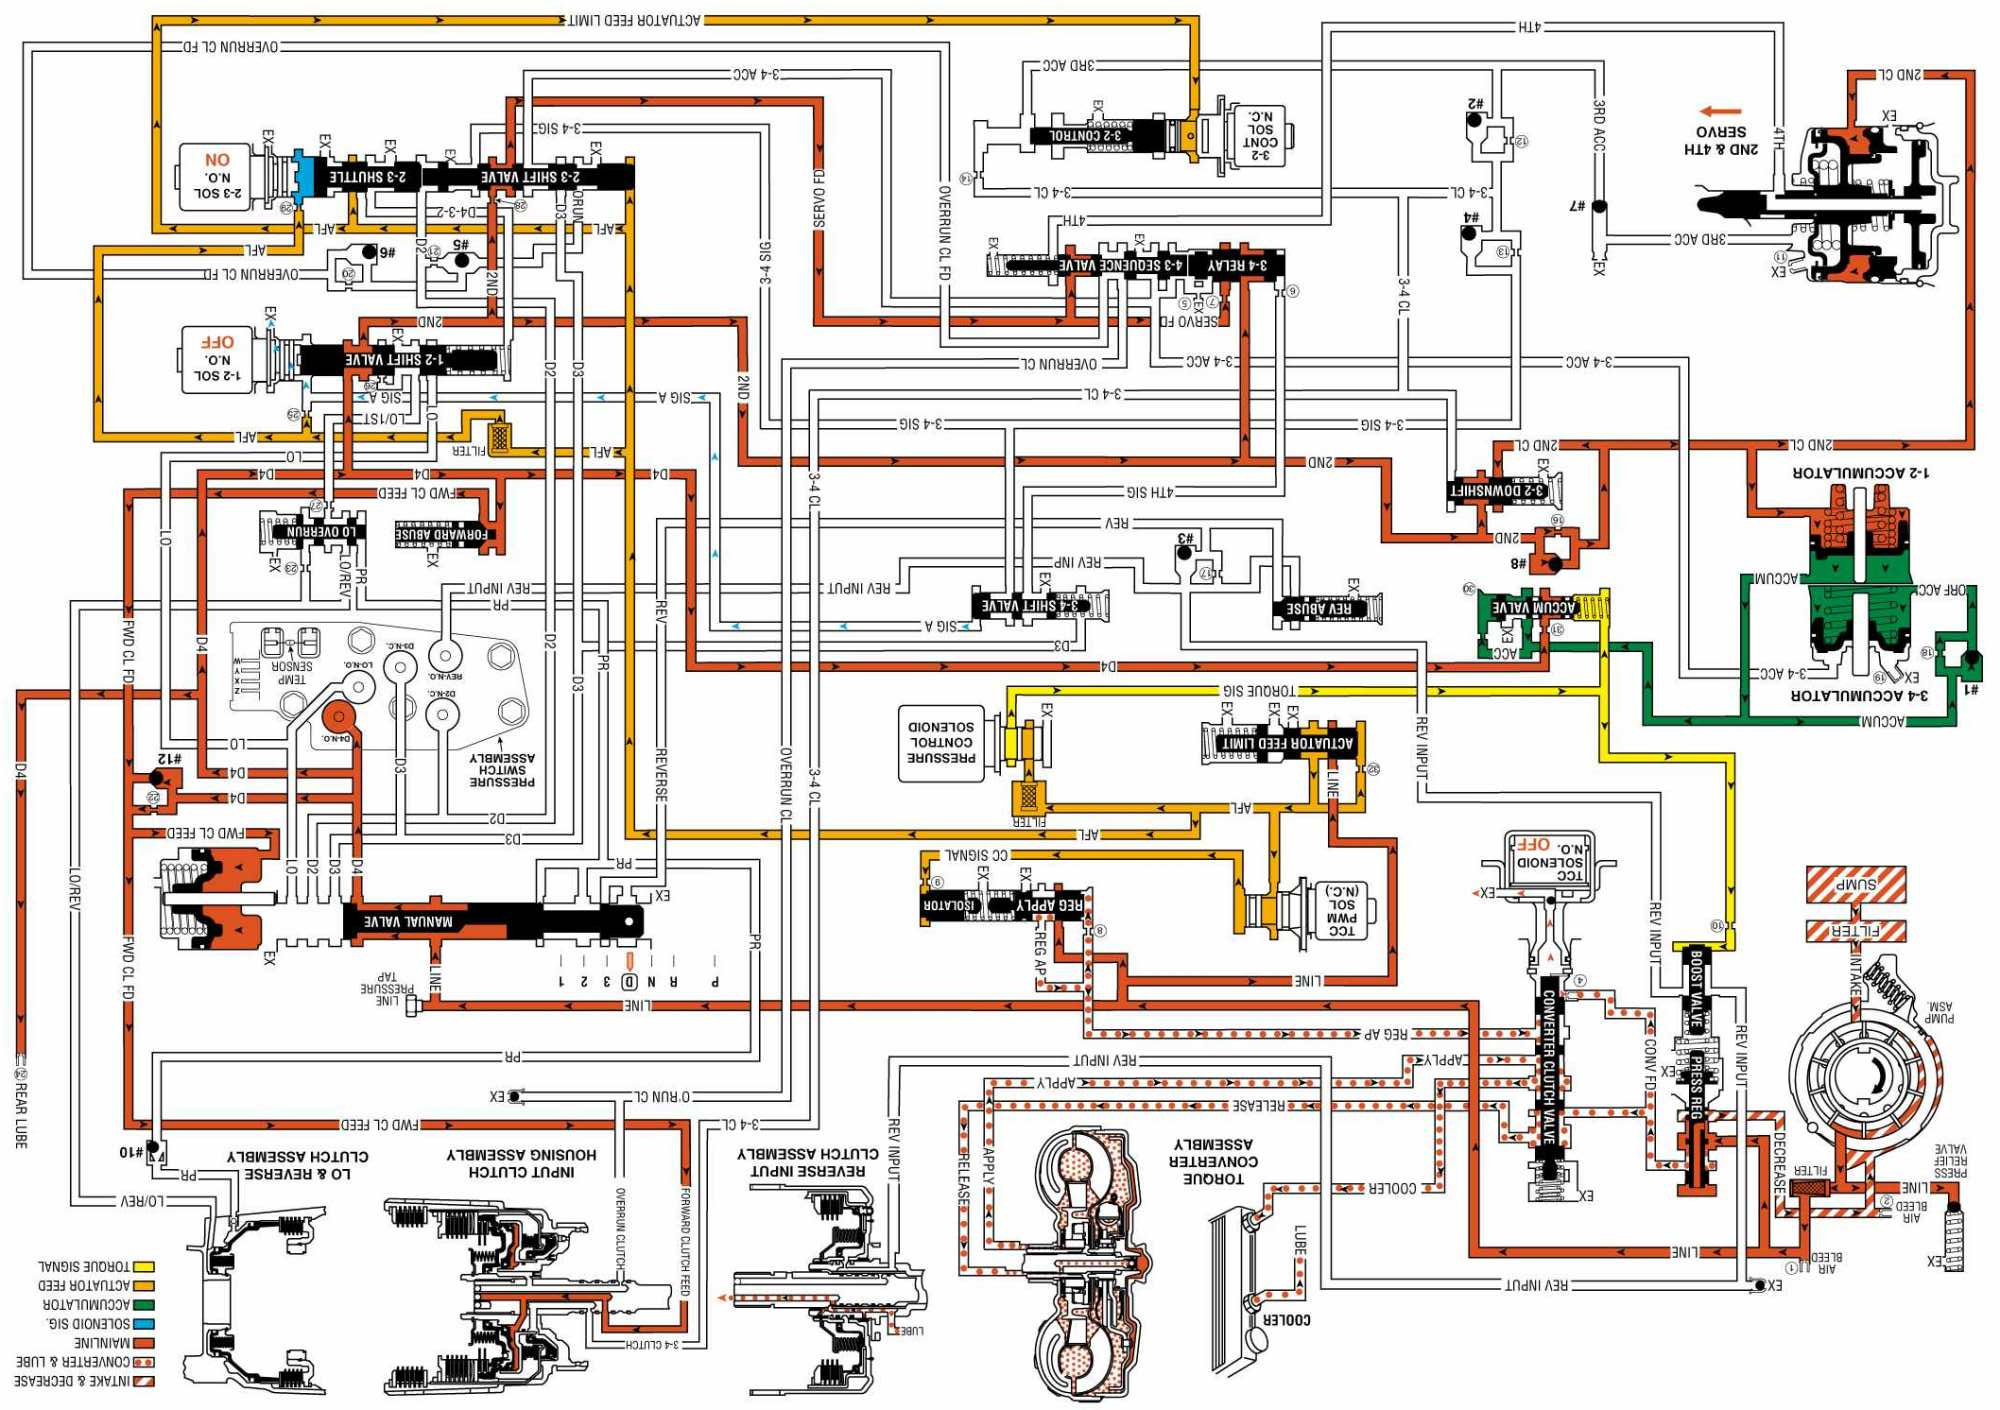 4L60e Solenoid Diagram 4l60e Transmission Hydraulic Diagram On Chevy 4l60e Transmission